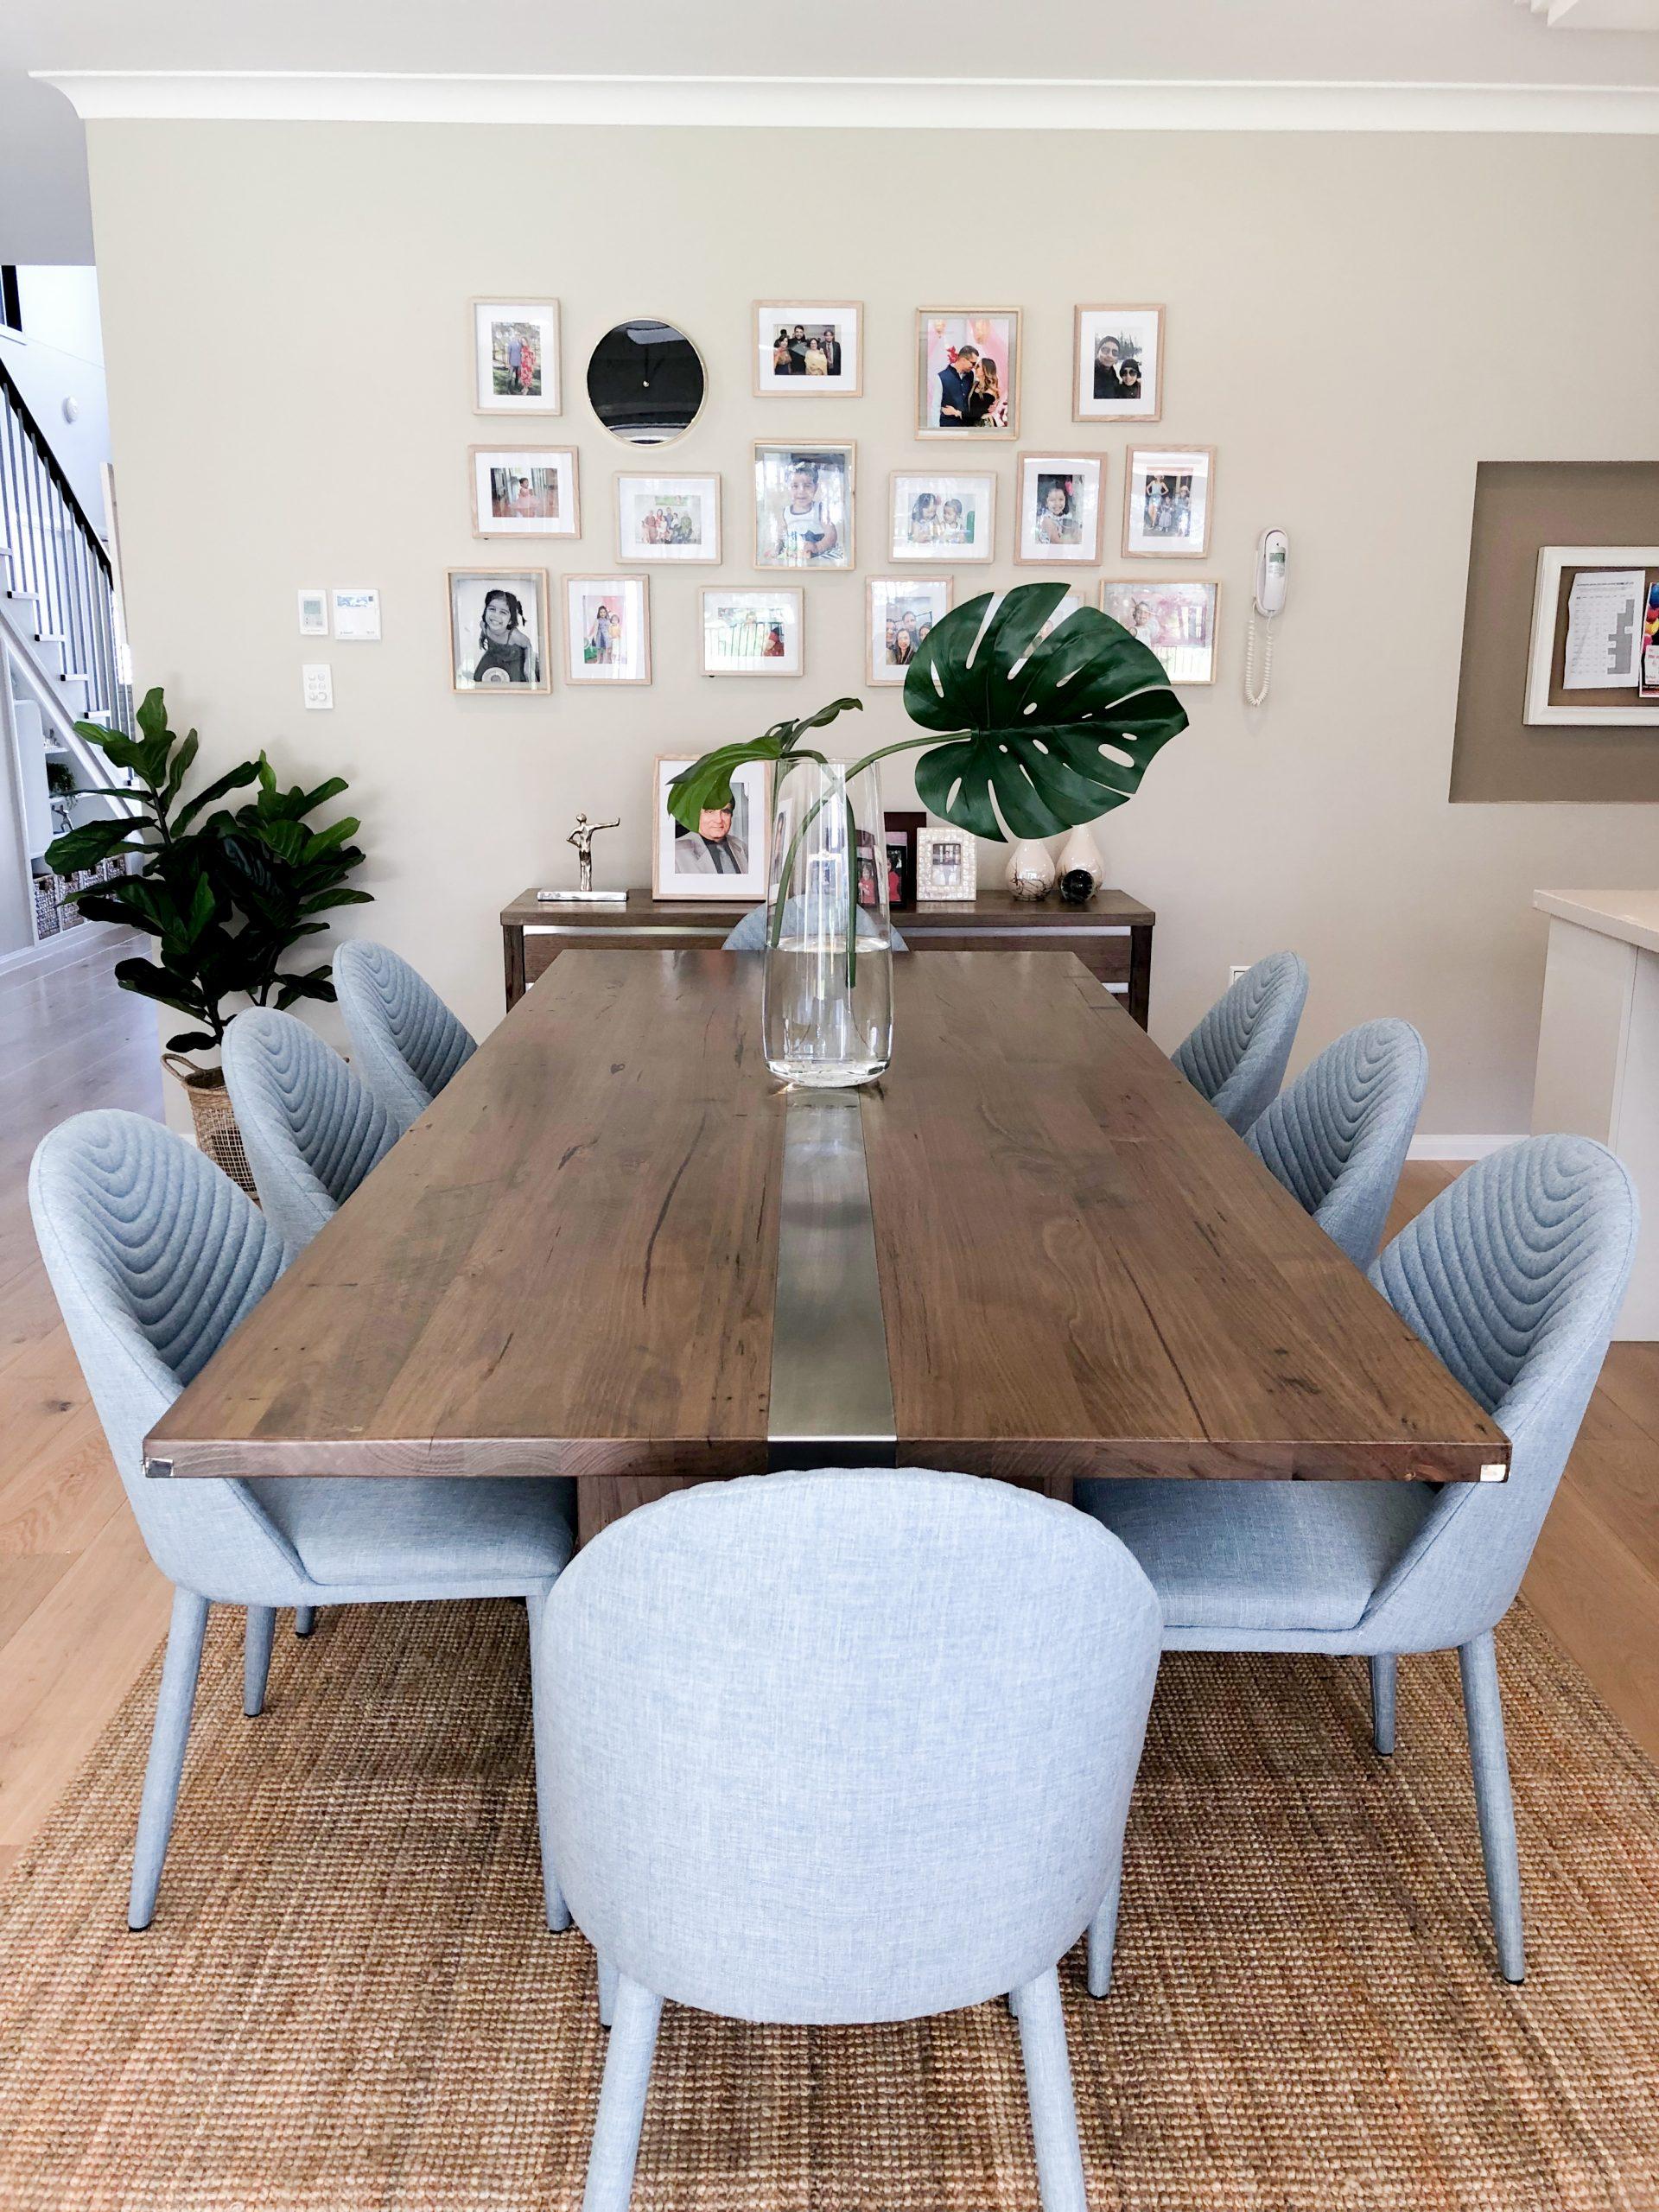 https://www.ivyandfinch.com.au/wp-content/uploads/2021/02/Interior-Design-Hope-Island-Dining-scaled.jpg